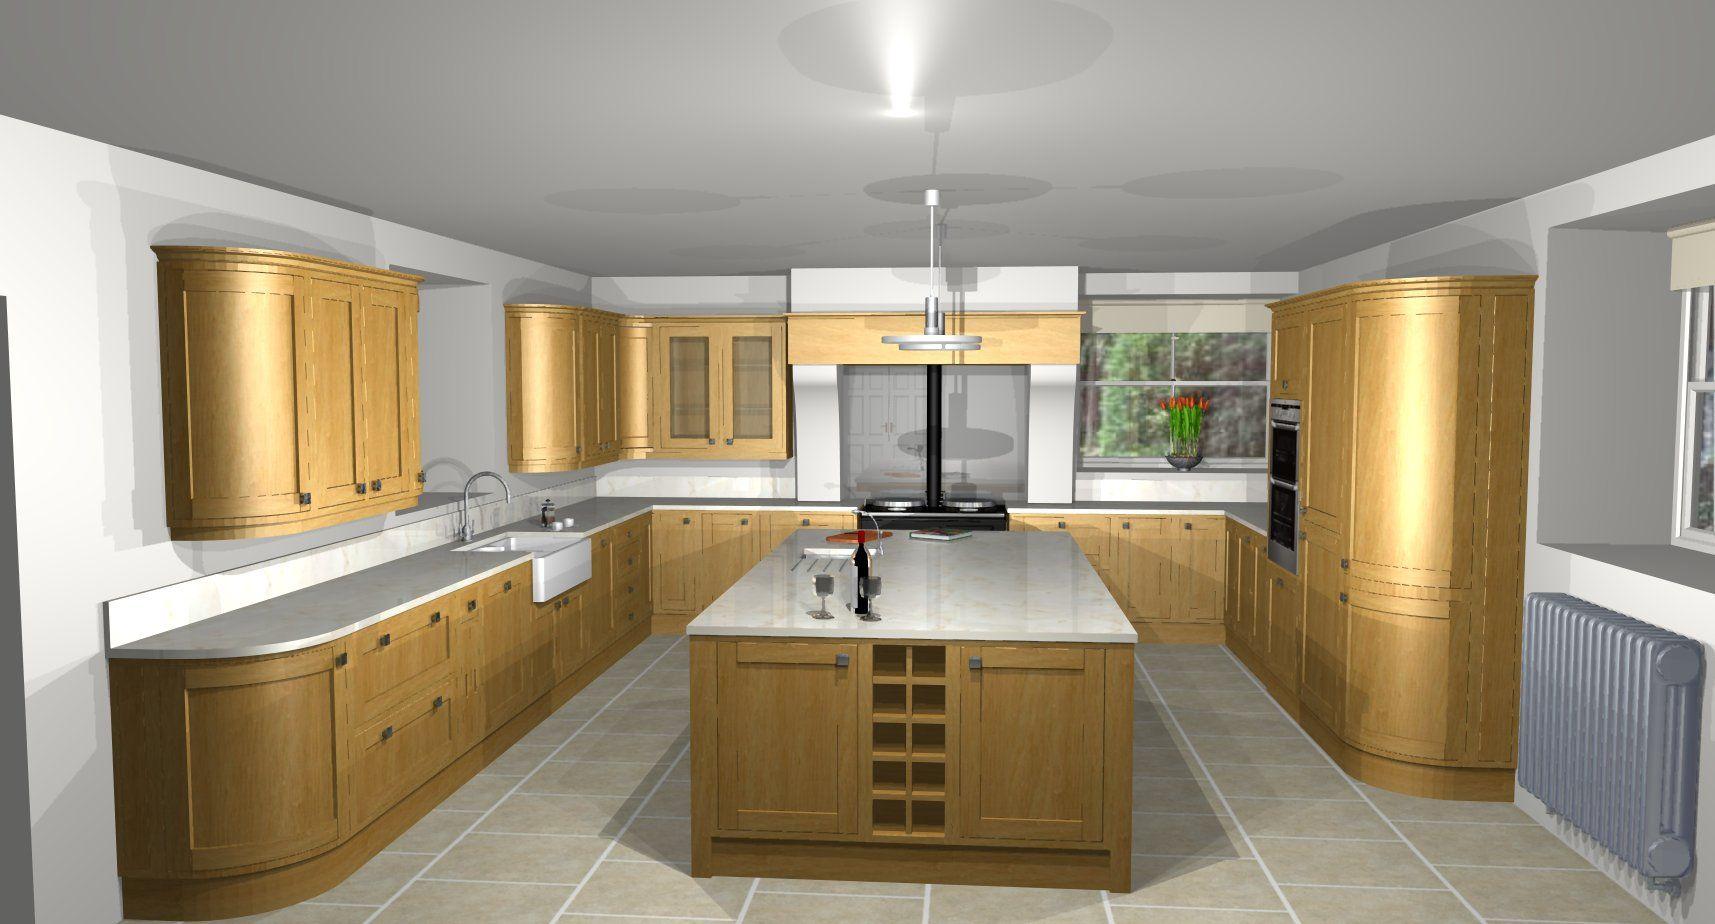 Kitchen Design Online Software Unique Kitchen Cad Design Software  Best Interior Paint Brand Check More Decorating Design